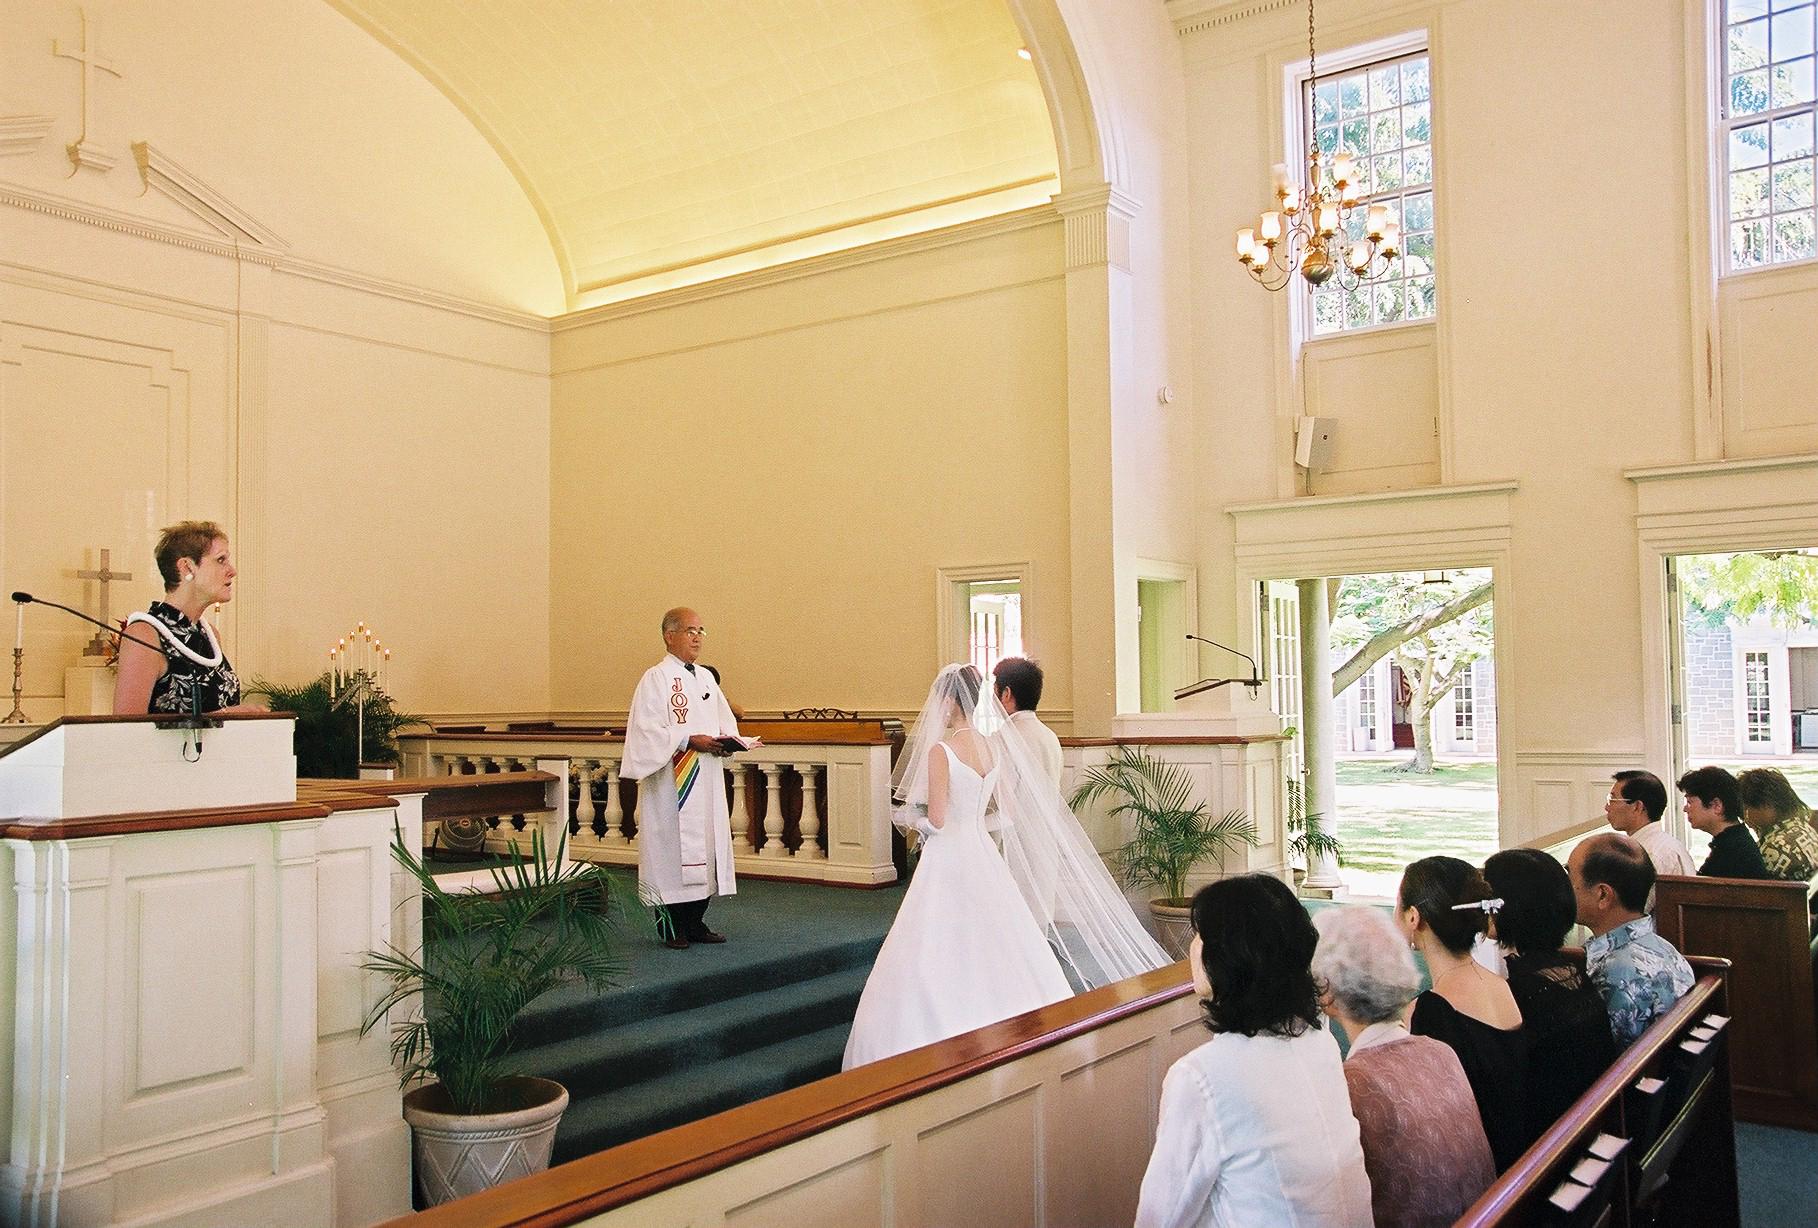 fd70a086edb7a ハワイでの結婚式・挙式の費用を大公開 家族の旅費は?